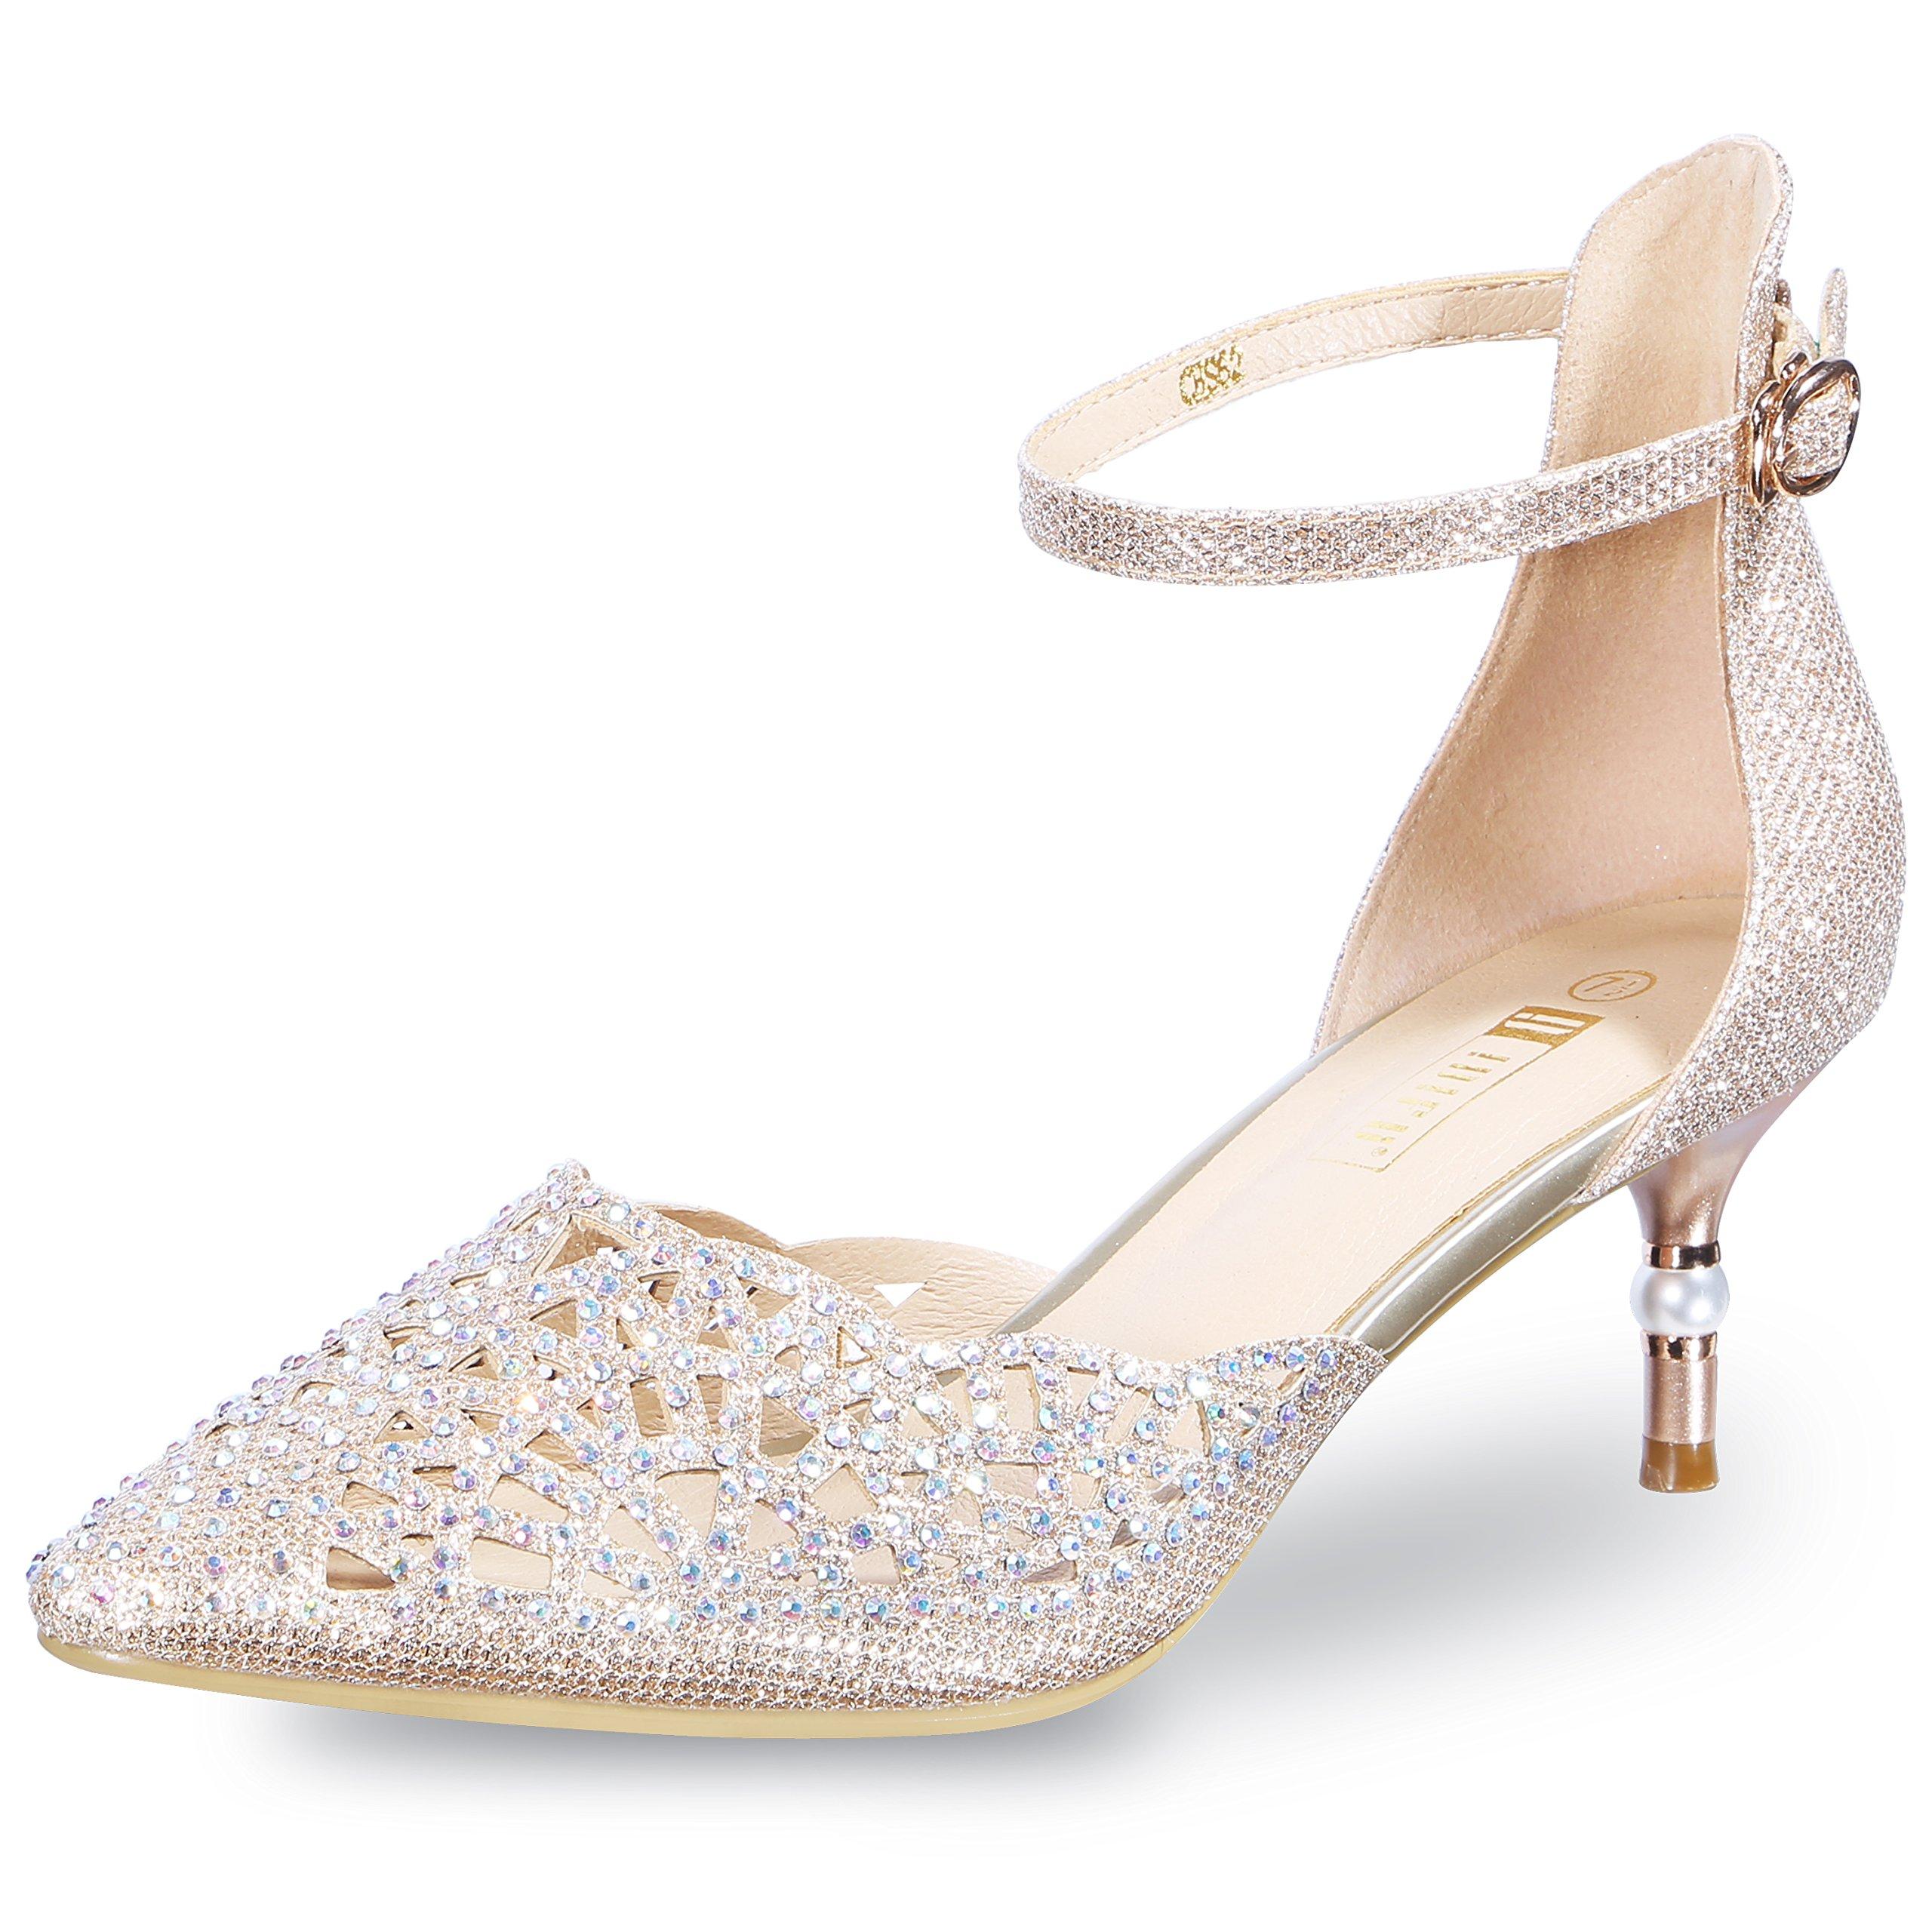 IDIFU Women's IN2 Candice Rhinestones Sequins Mid Heels Stiletto Wedding Pump Gold 9 B(M) US